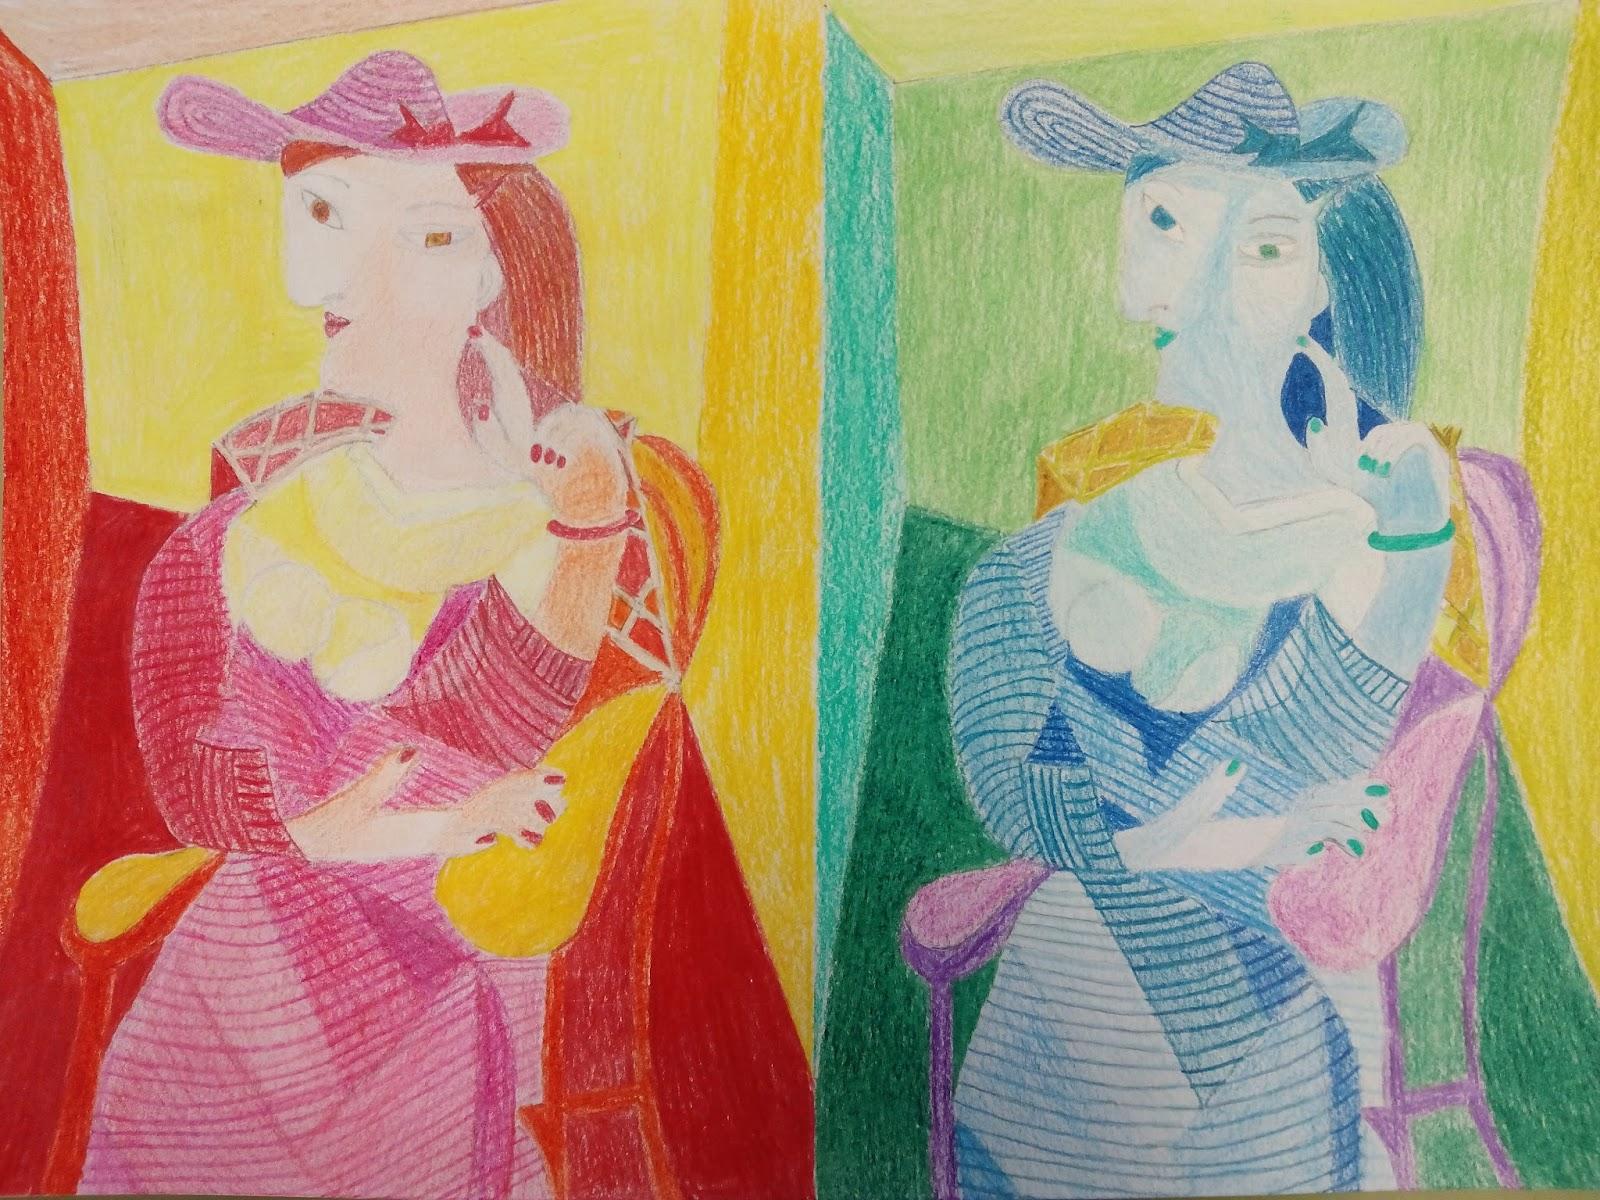 Blog de pl stica del ies castilla 2014 2015 colores fr os - Gama colores frios ...